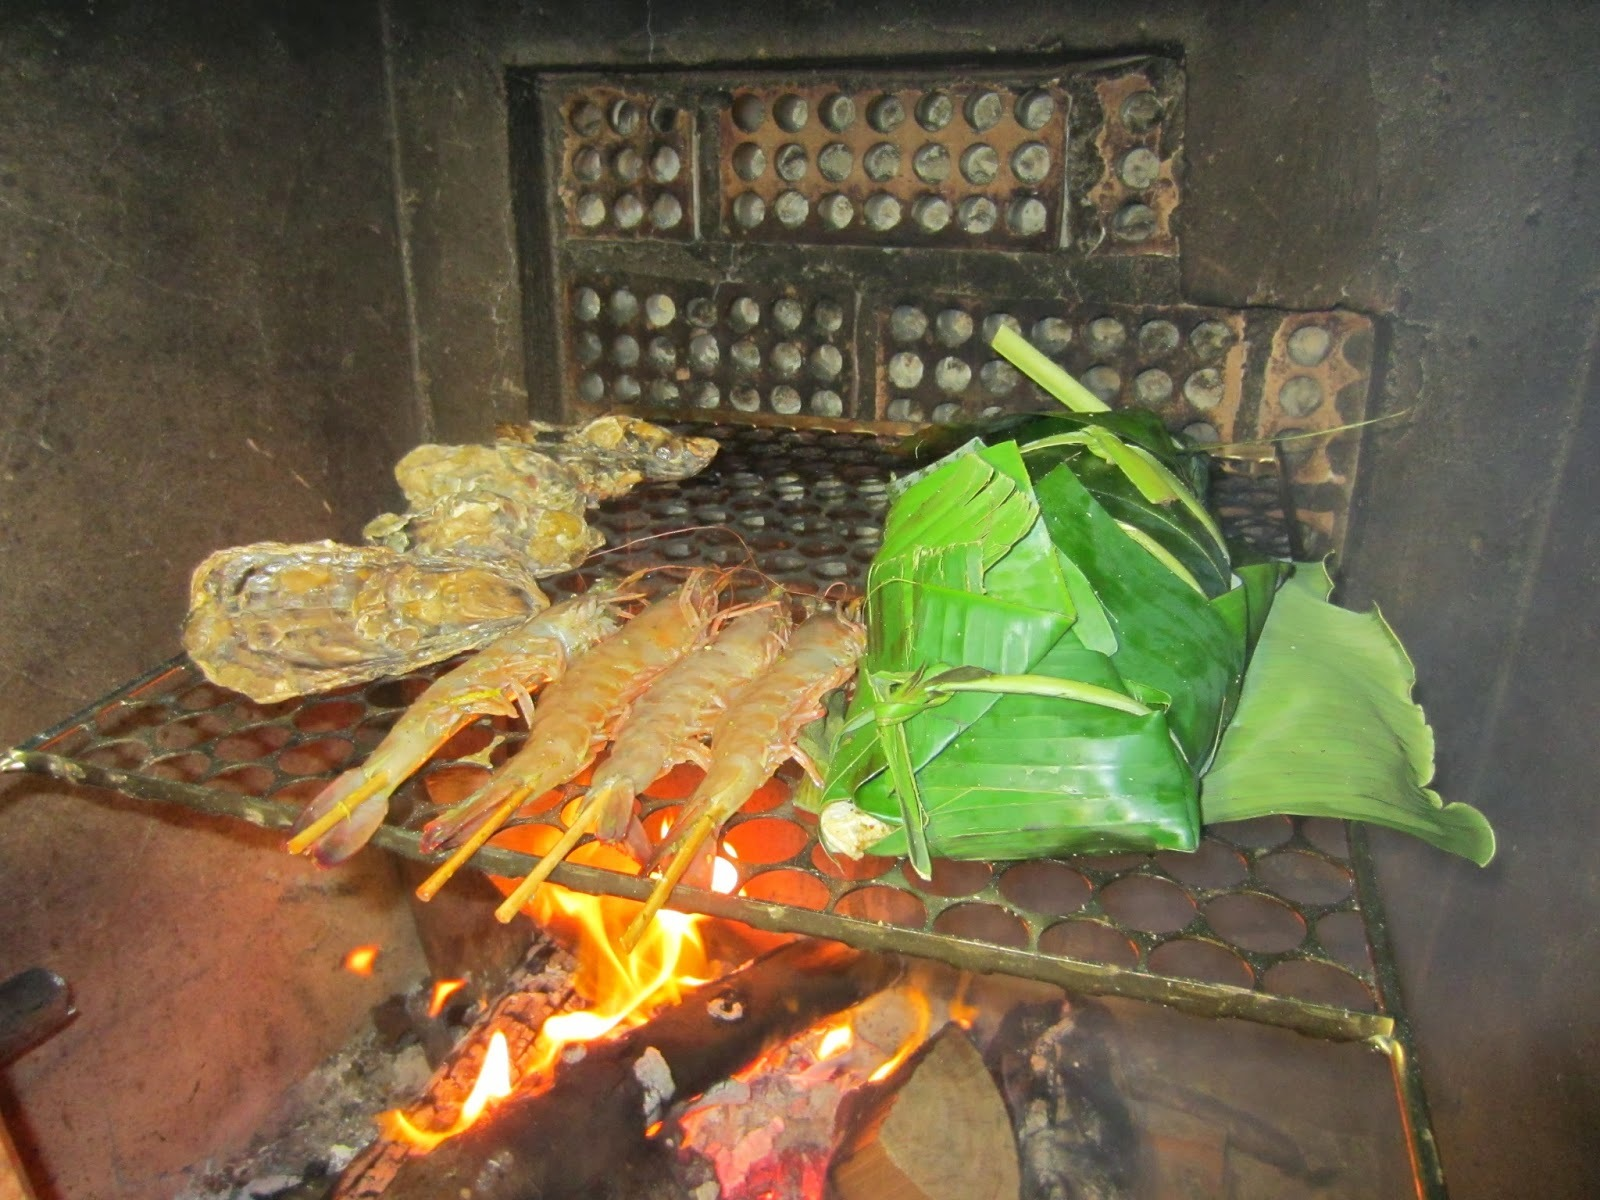 como fazer peixe assado na churrasqueira recheado com farofa